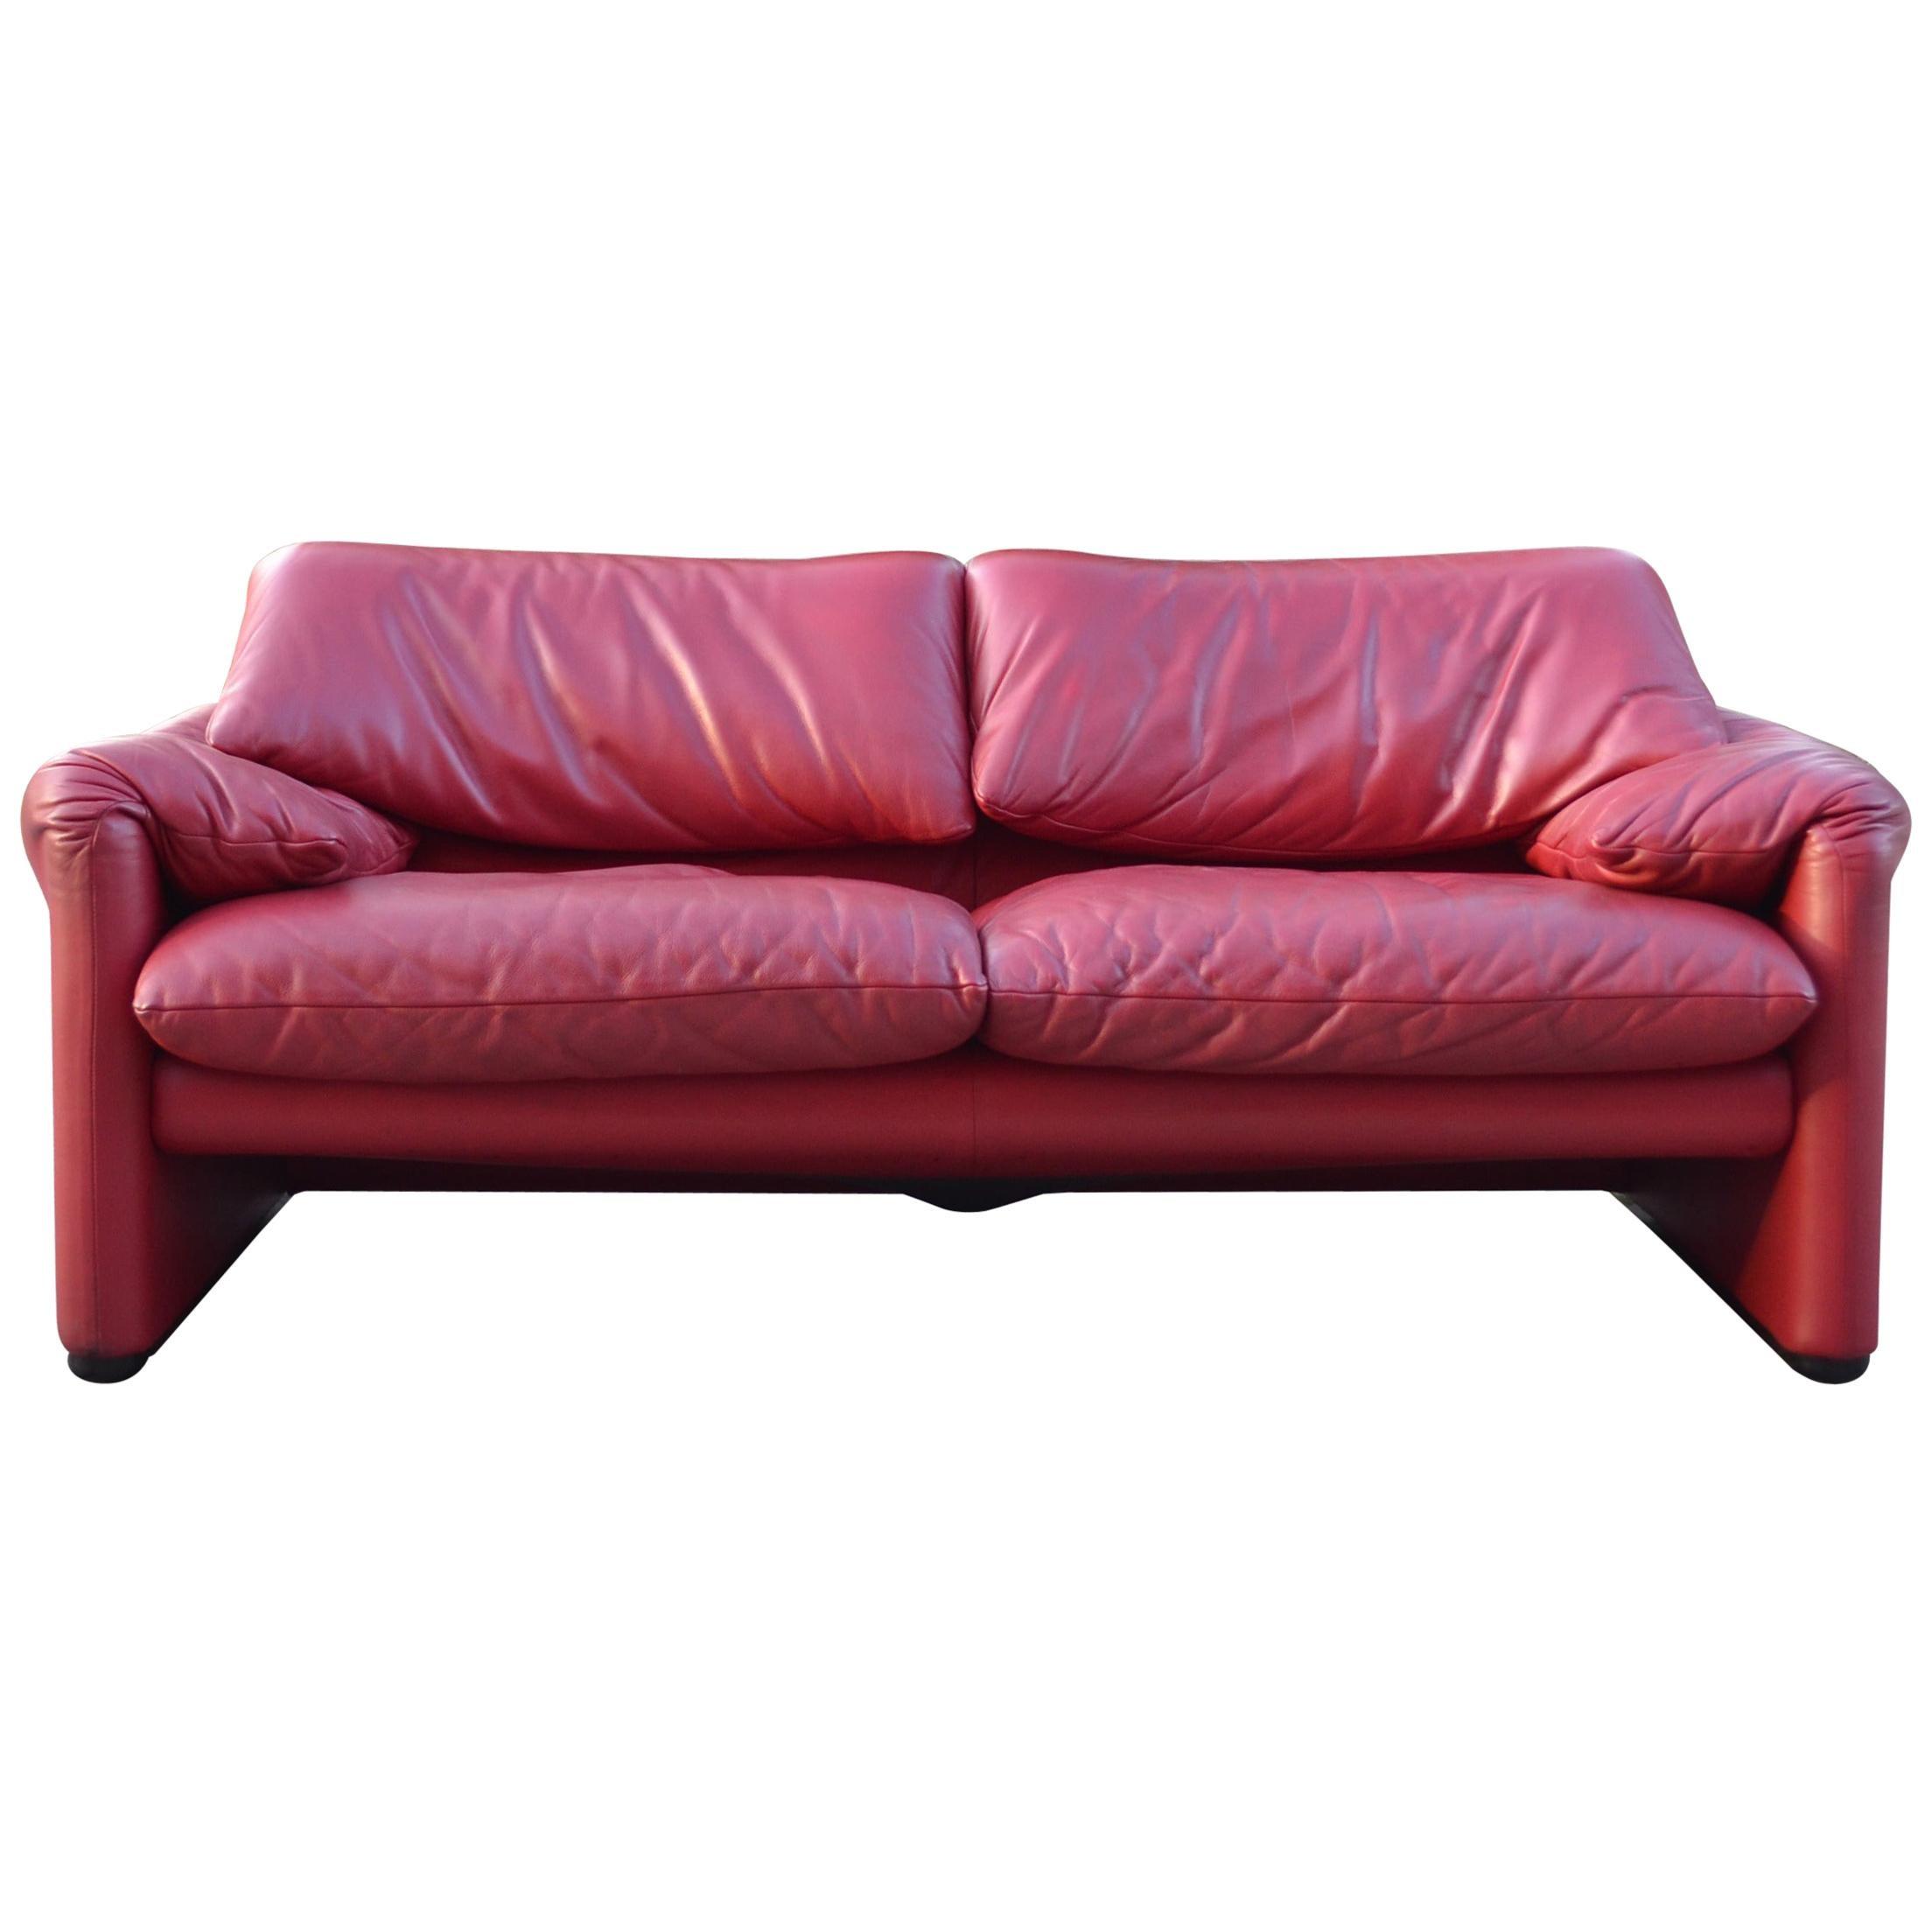 Cassina Maralunga Red Berry Leather Sofa by Vico Magistretti